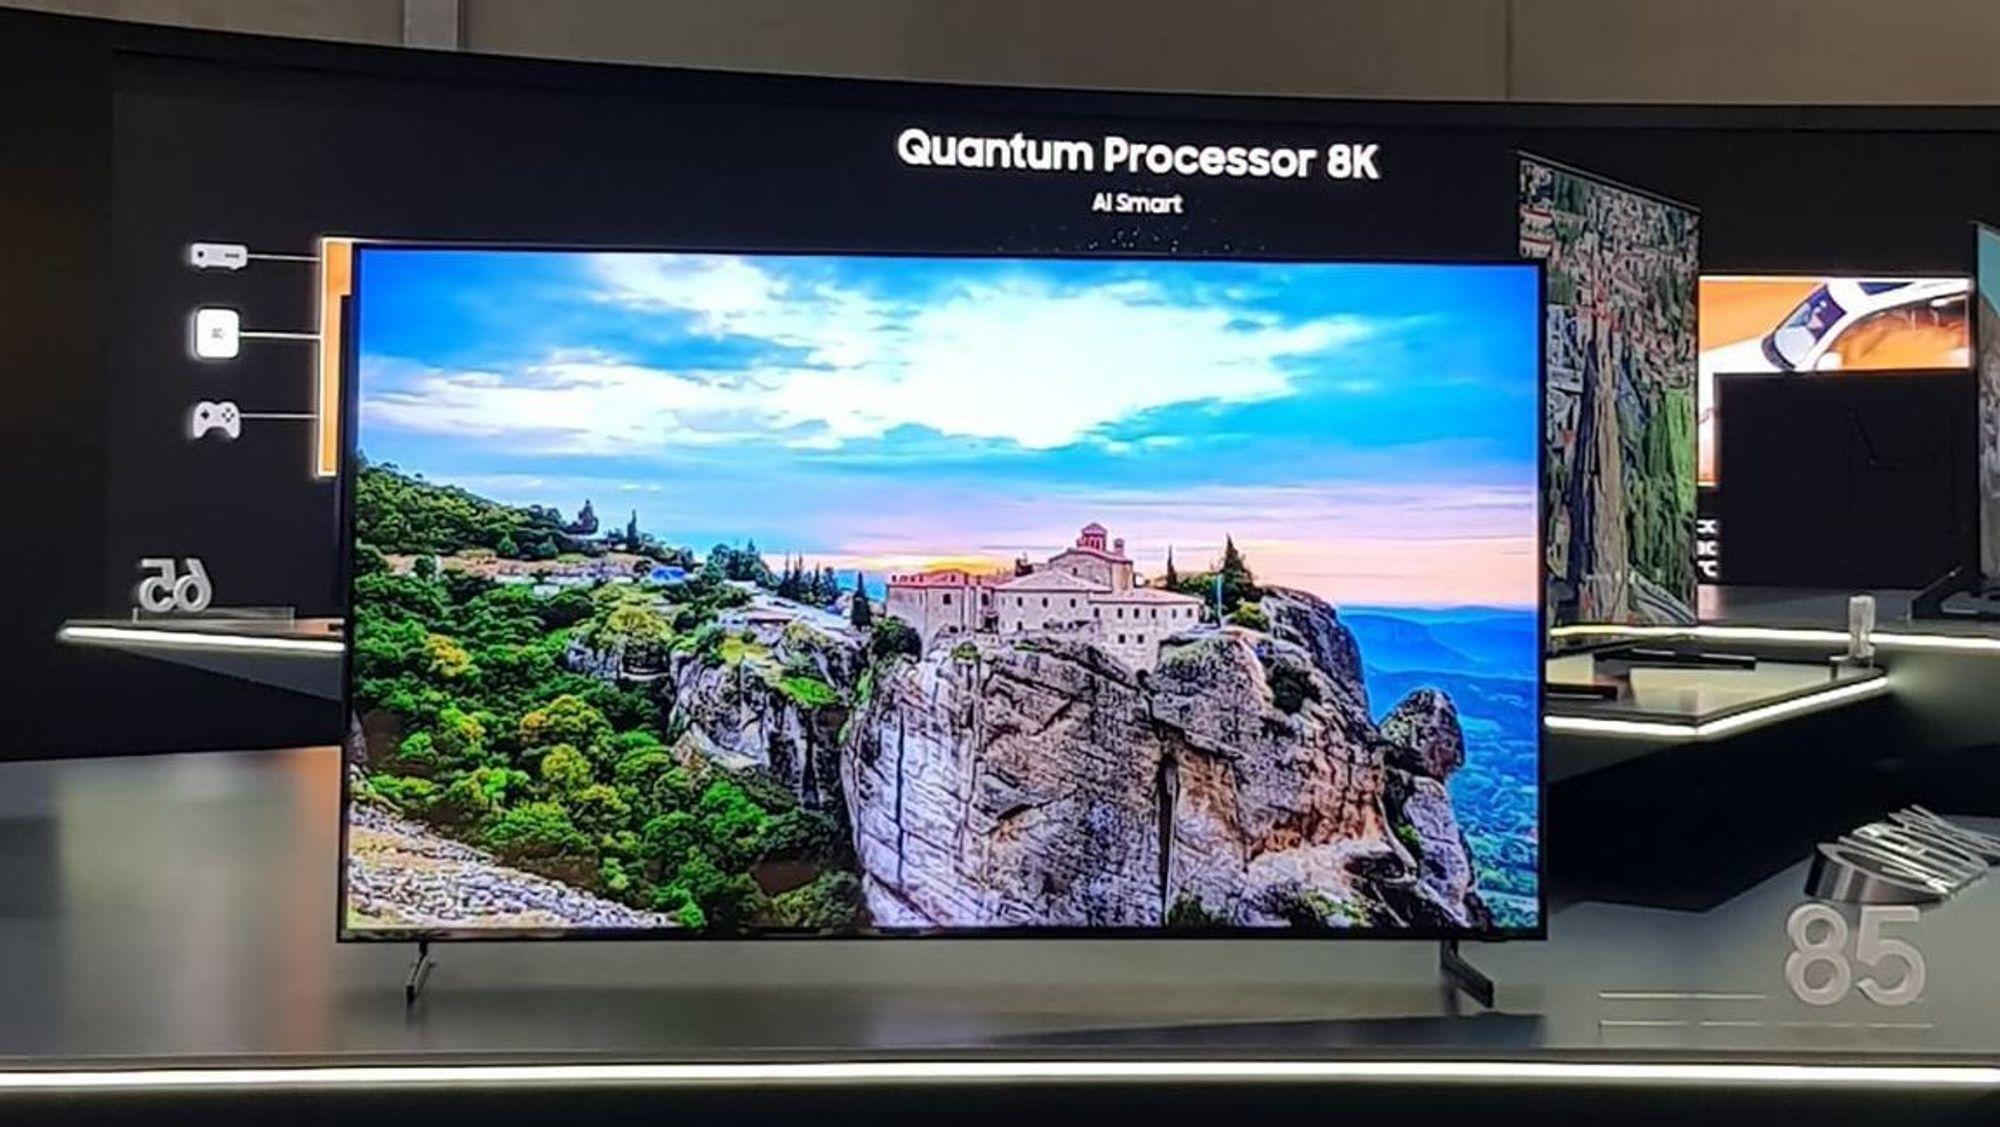 CUT: Samsung Q900 Samsung's first 8K TV will arrive in